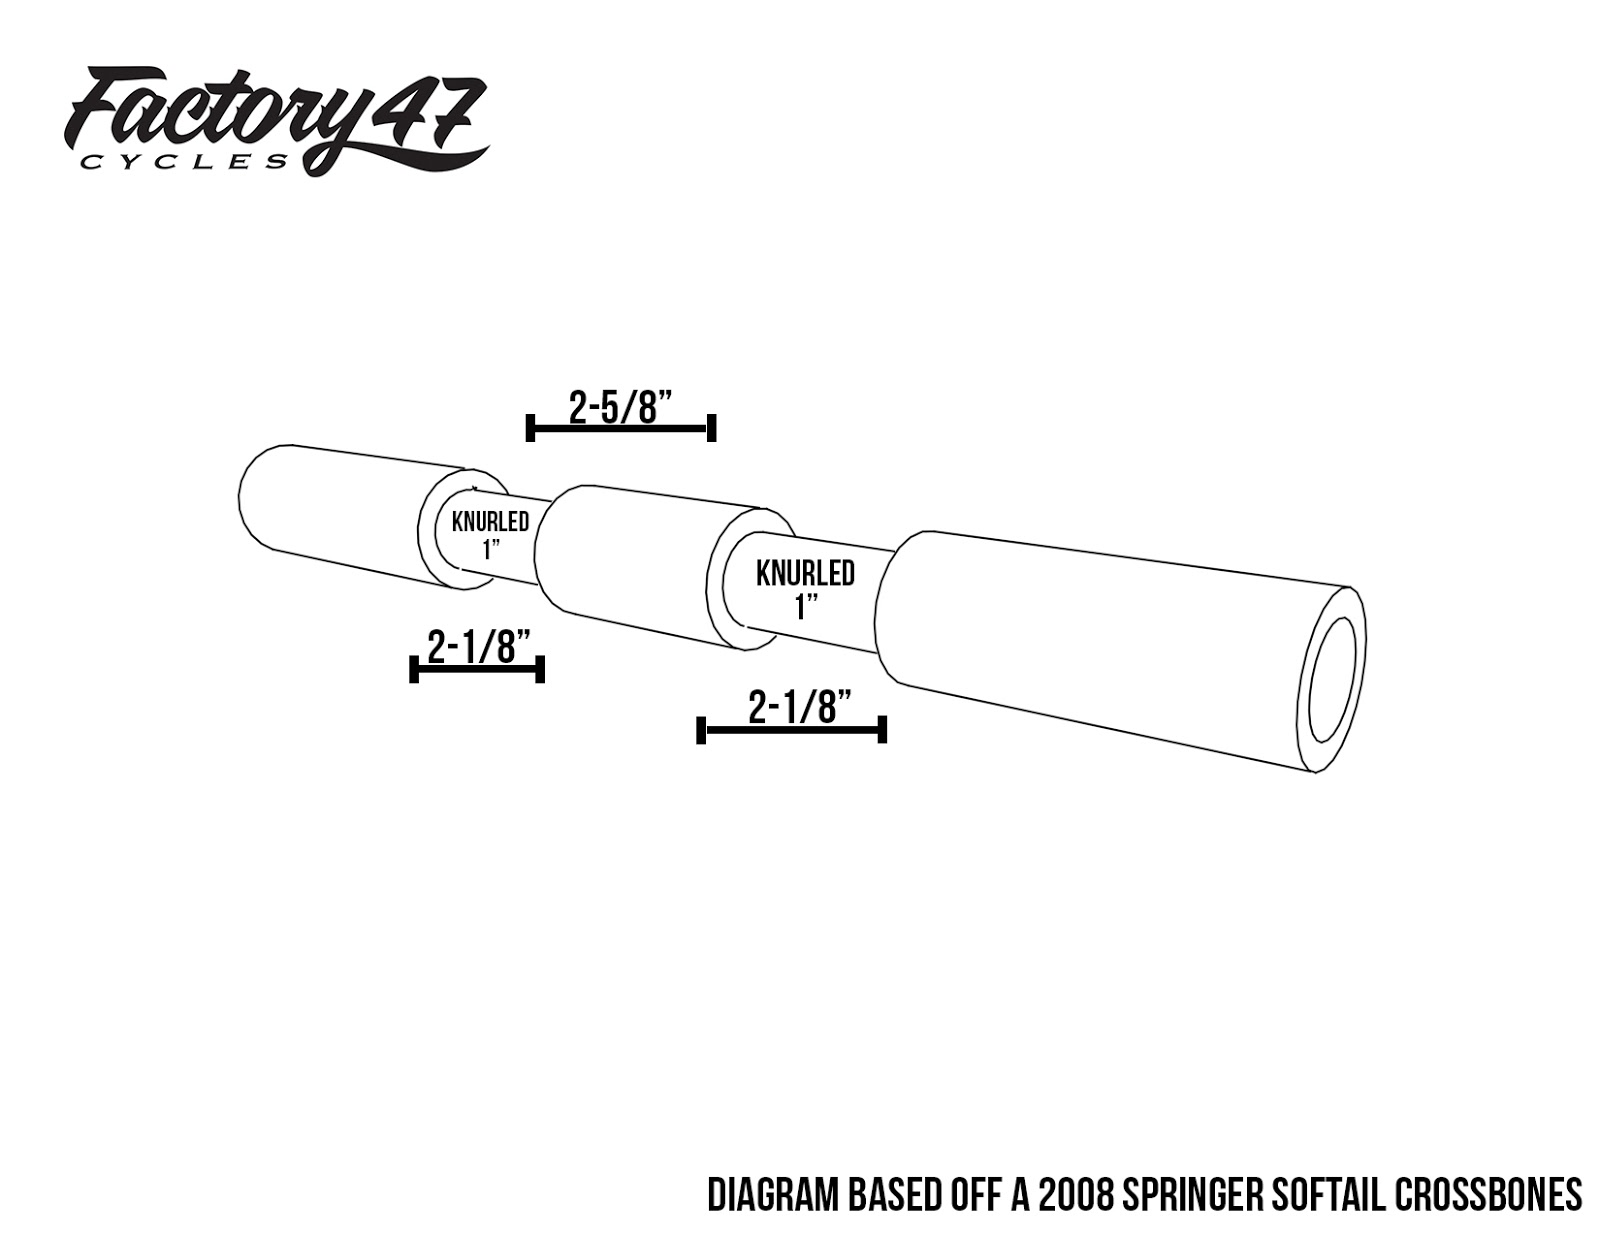 medium resolution of 2012 harley street glide radio wiring diagram 2000 mazda protege problems 2003 mazda protege